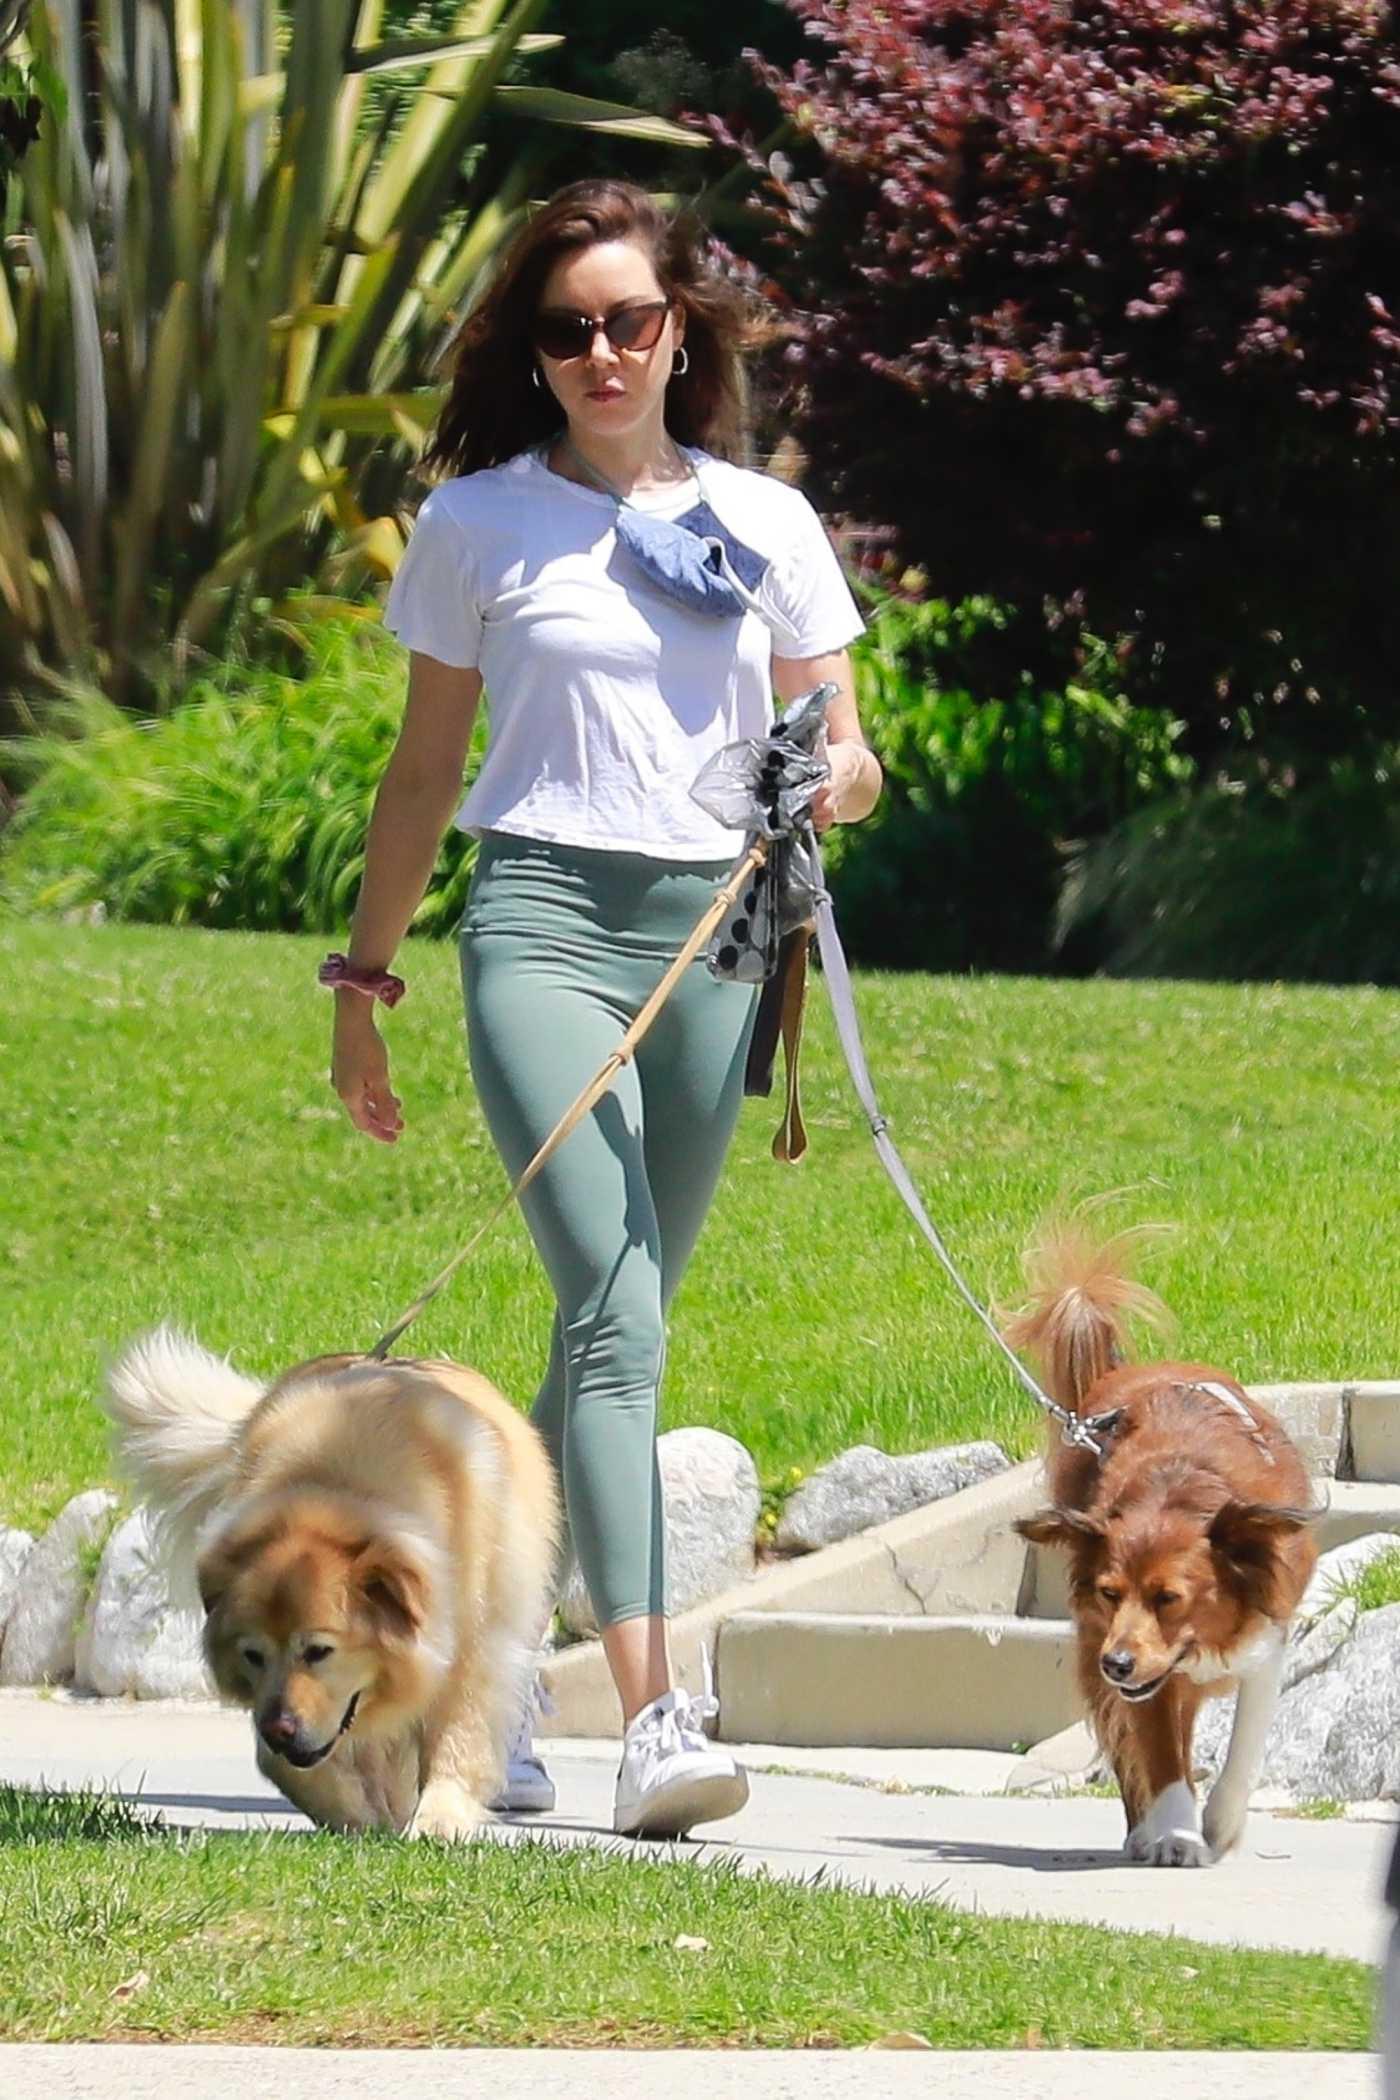 Aubrey Plaza in a White Tee Walks Her Dogs in Los Feliz 05/03/2020